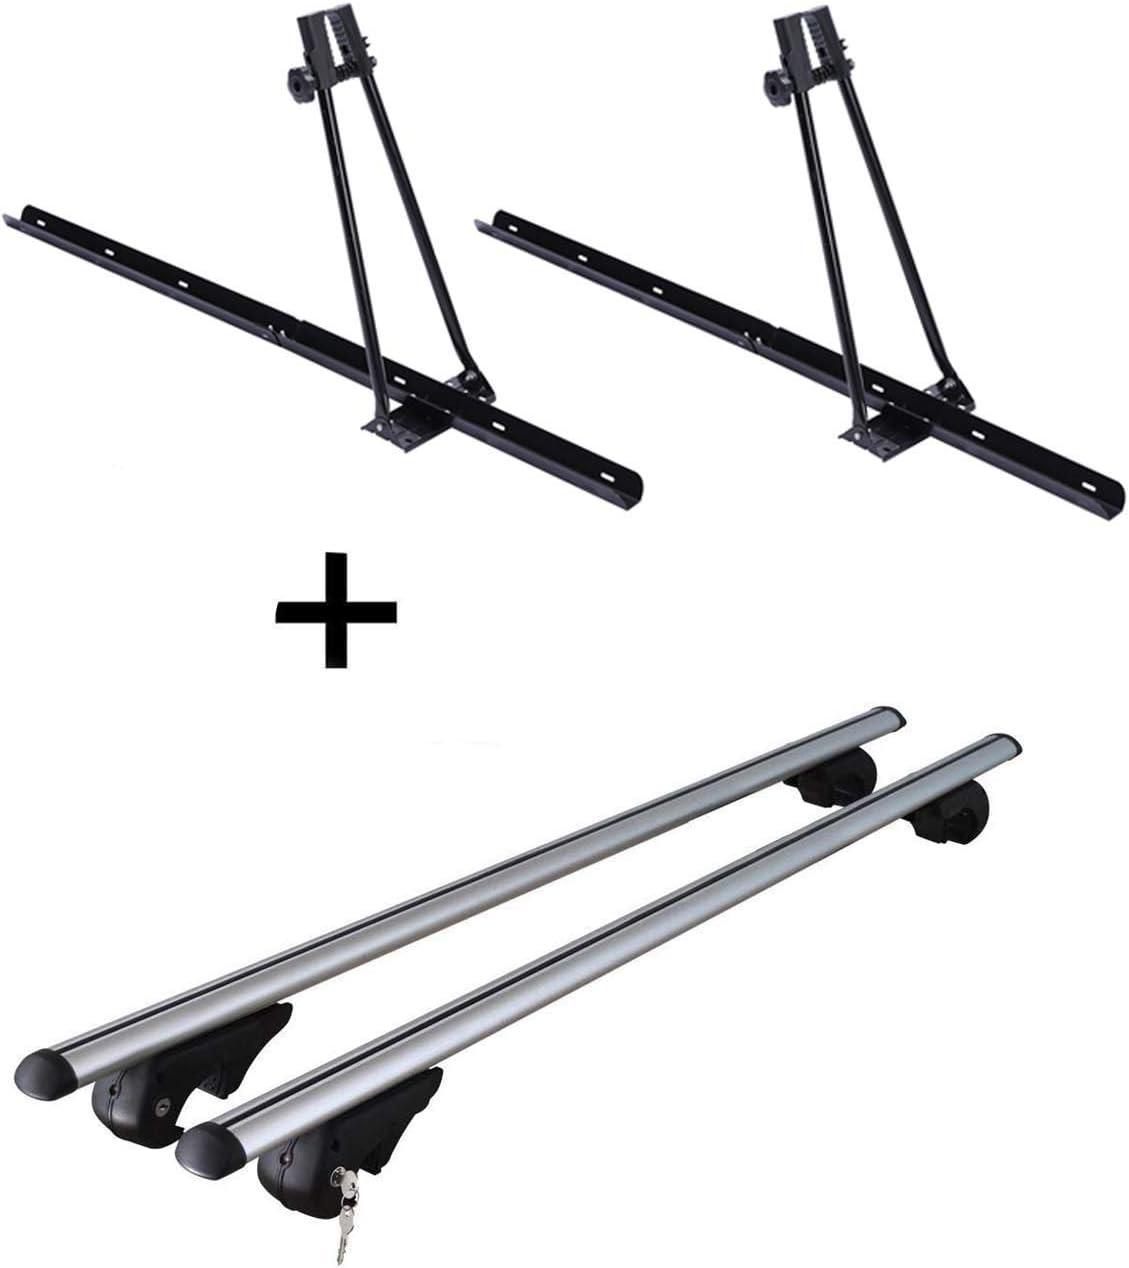 VDP 2X Fahrradtr/äger Orion Dachtr/äger Rio 120 kompatibel mit Skoda Fabia Kombi ab